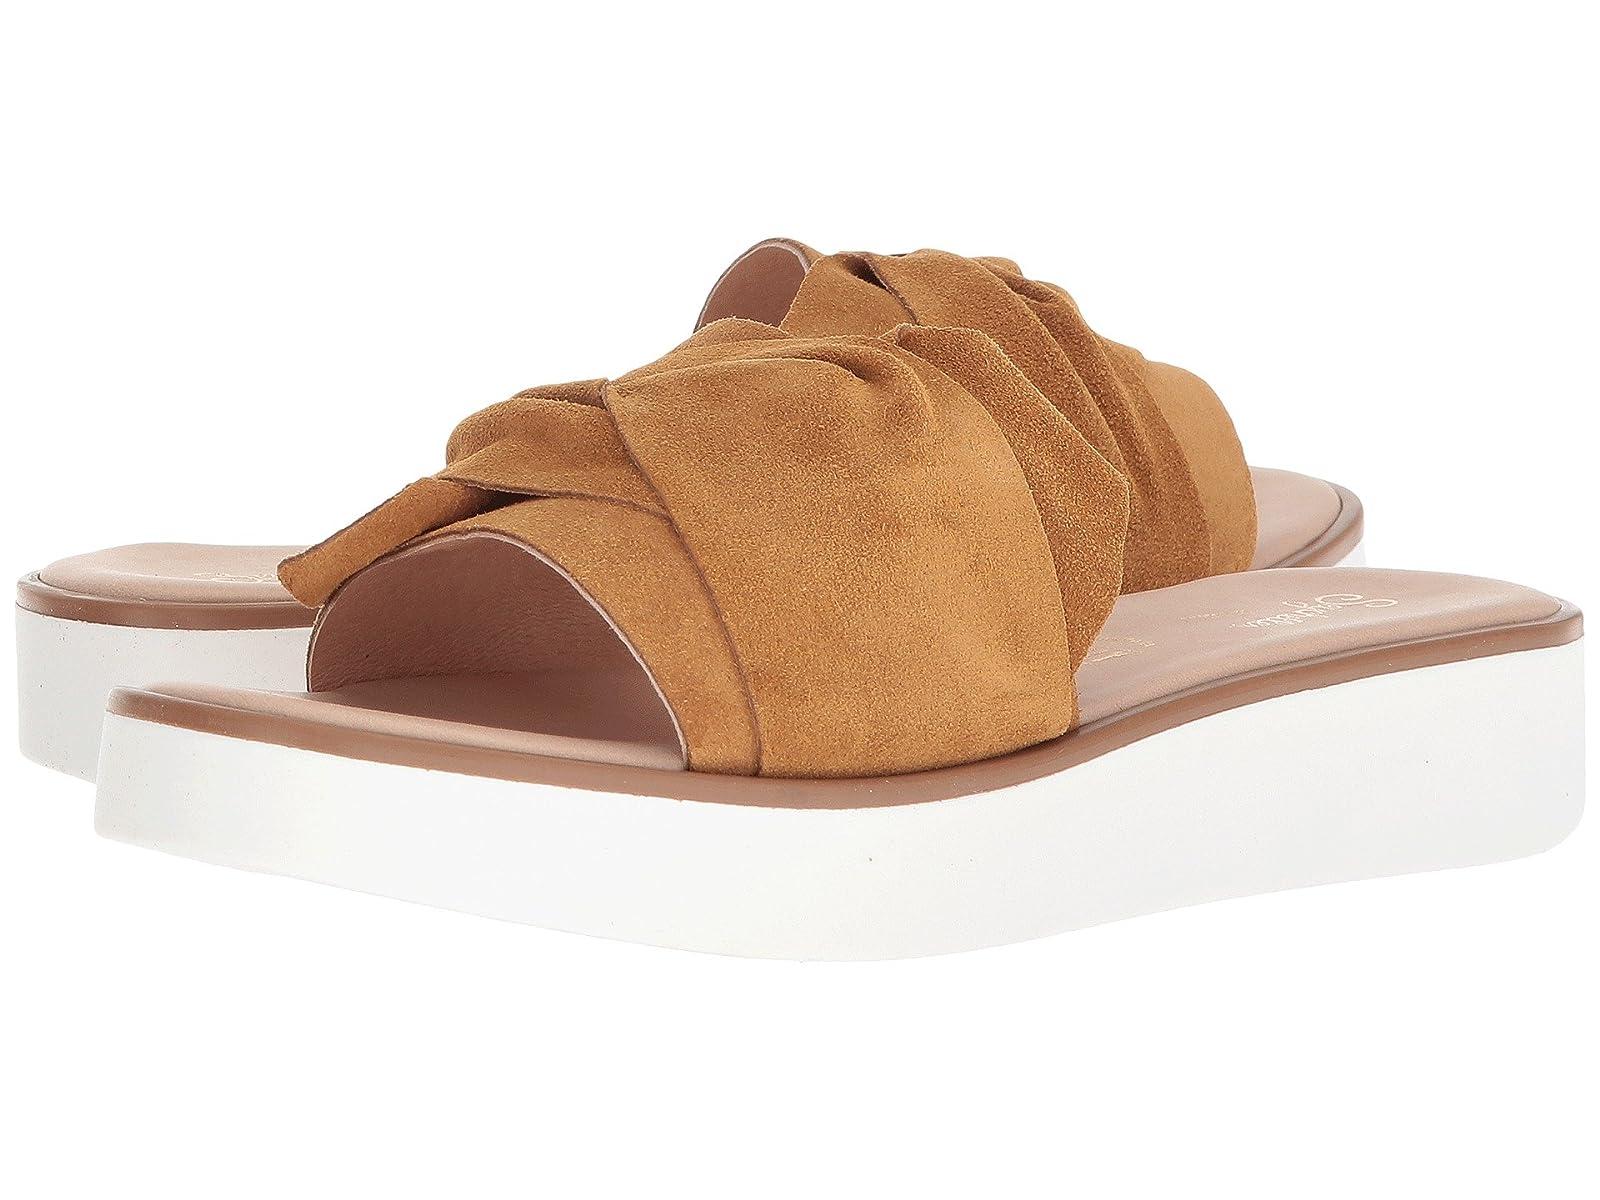 Seychelles CoastAtmospheric grades have affordable shoes